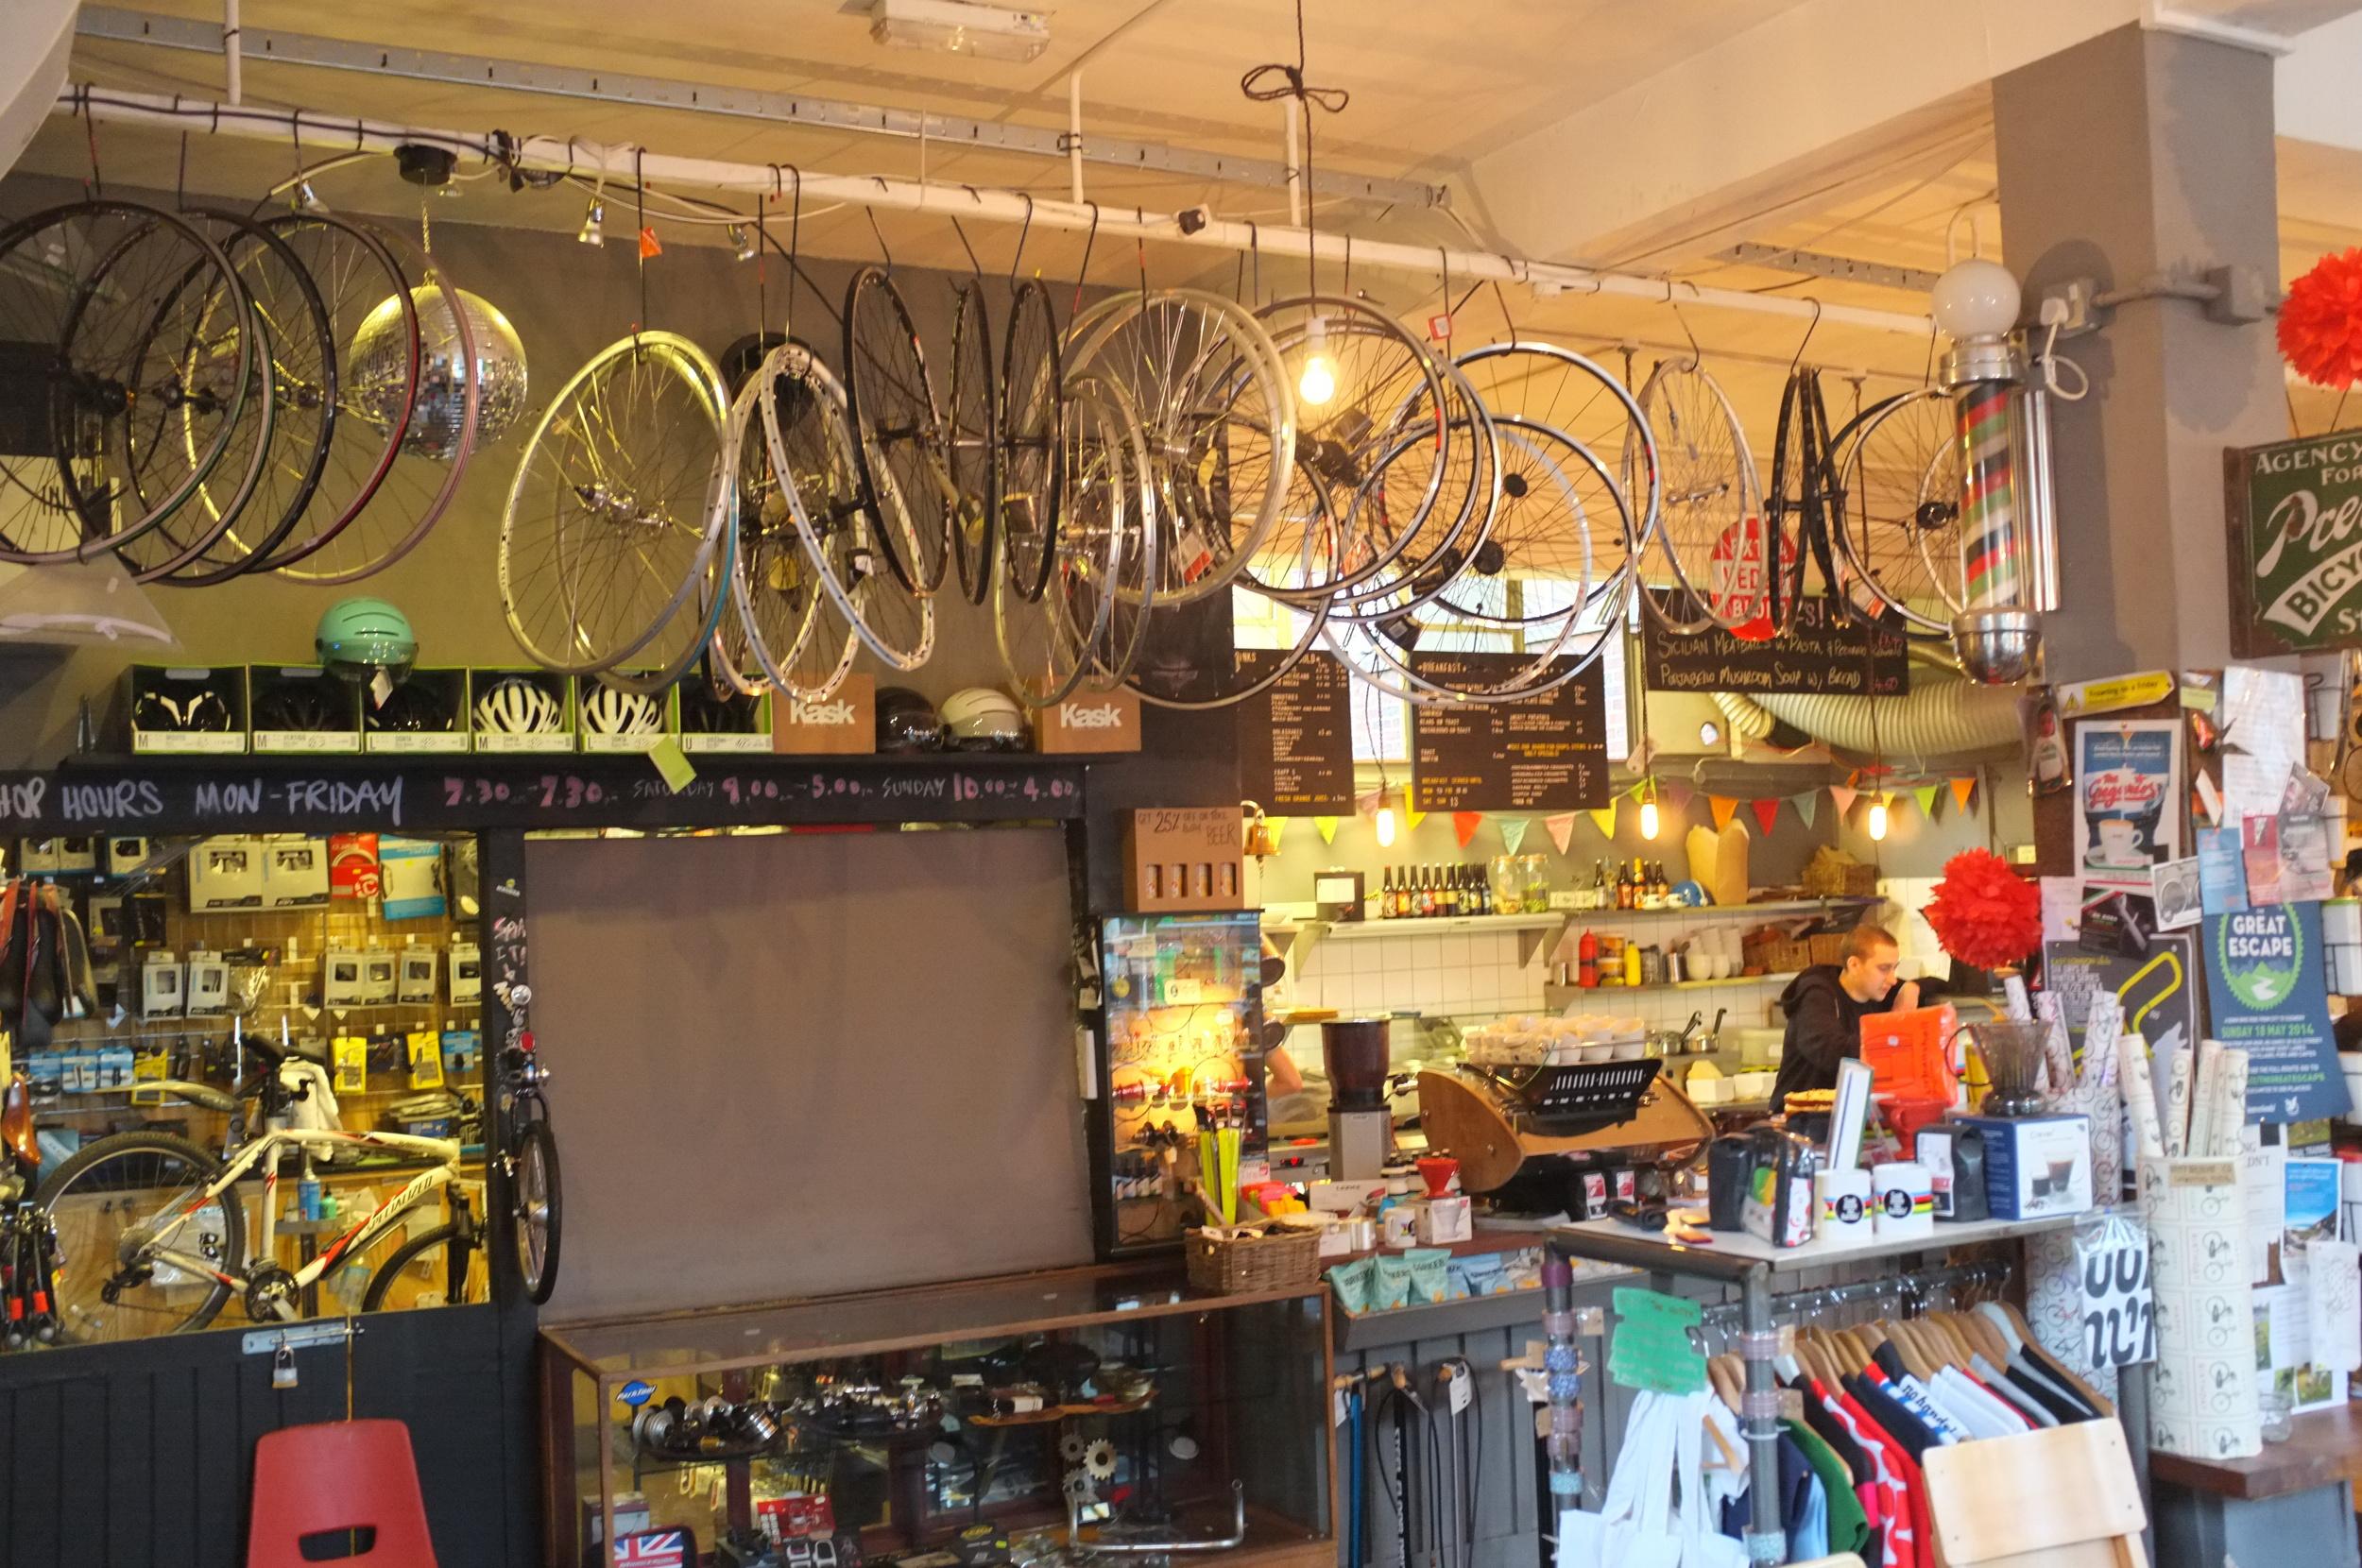 bike mechanic, bike shop, cycle shop, merchandise, cycle gear, bike parts